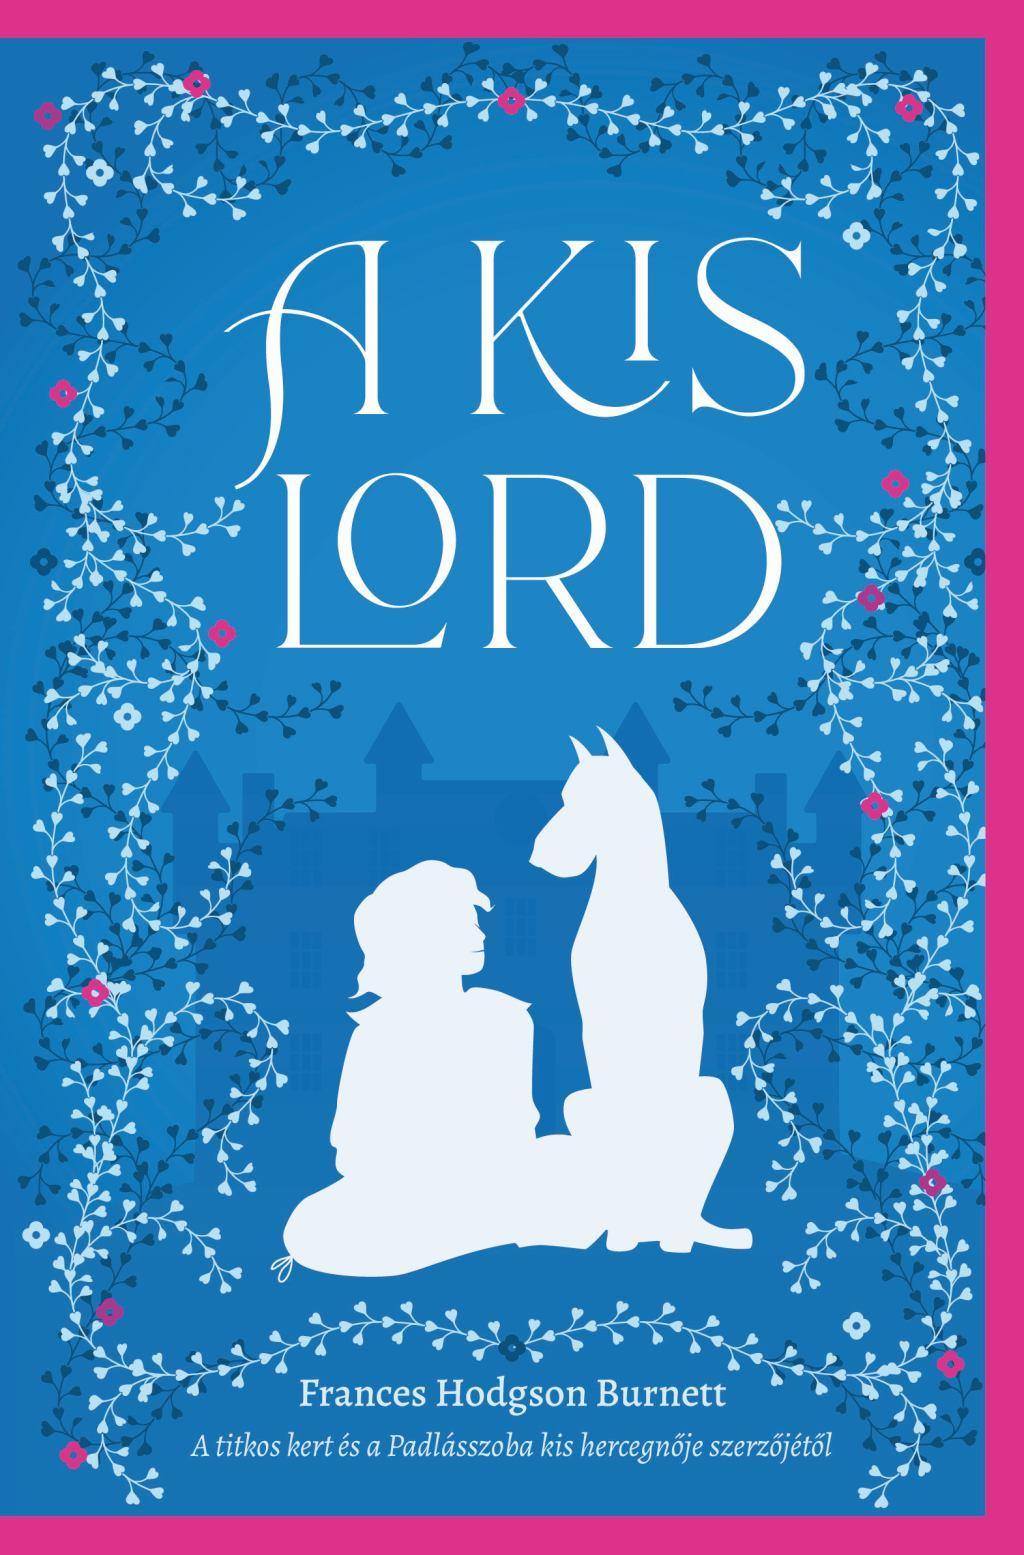 Francis Hodgson Burnett - A kis lord